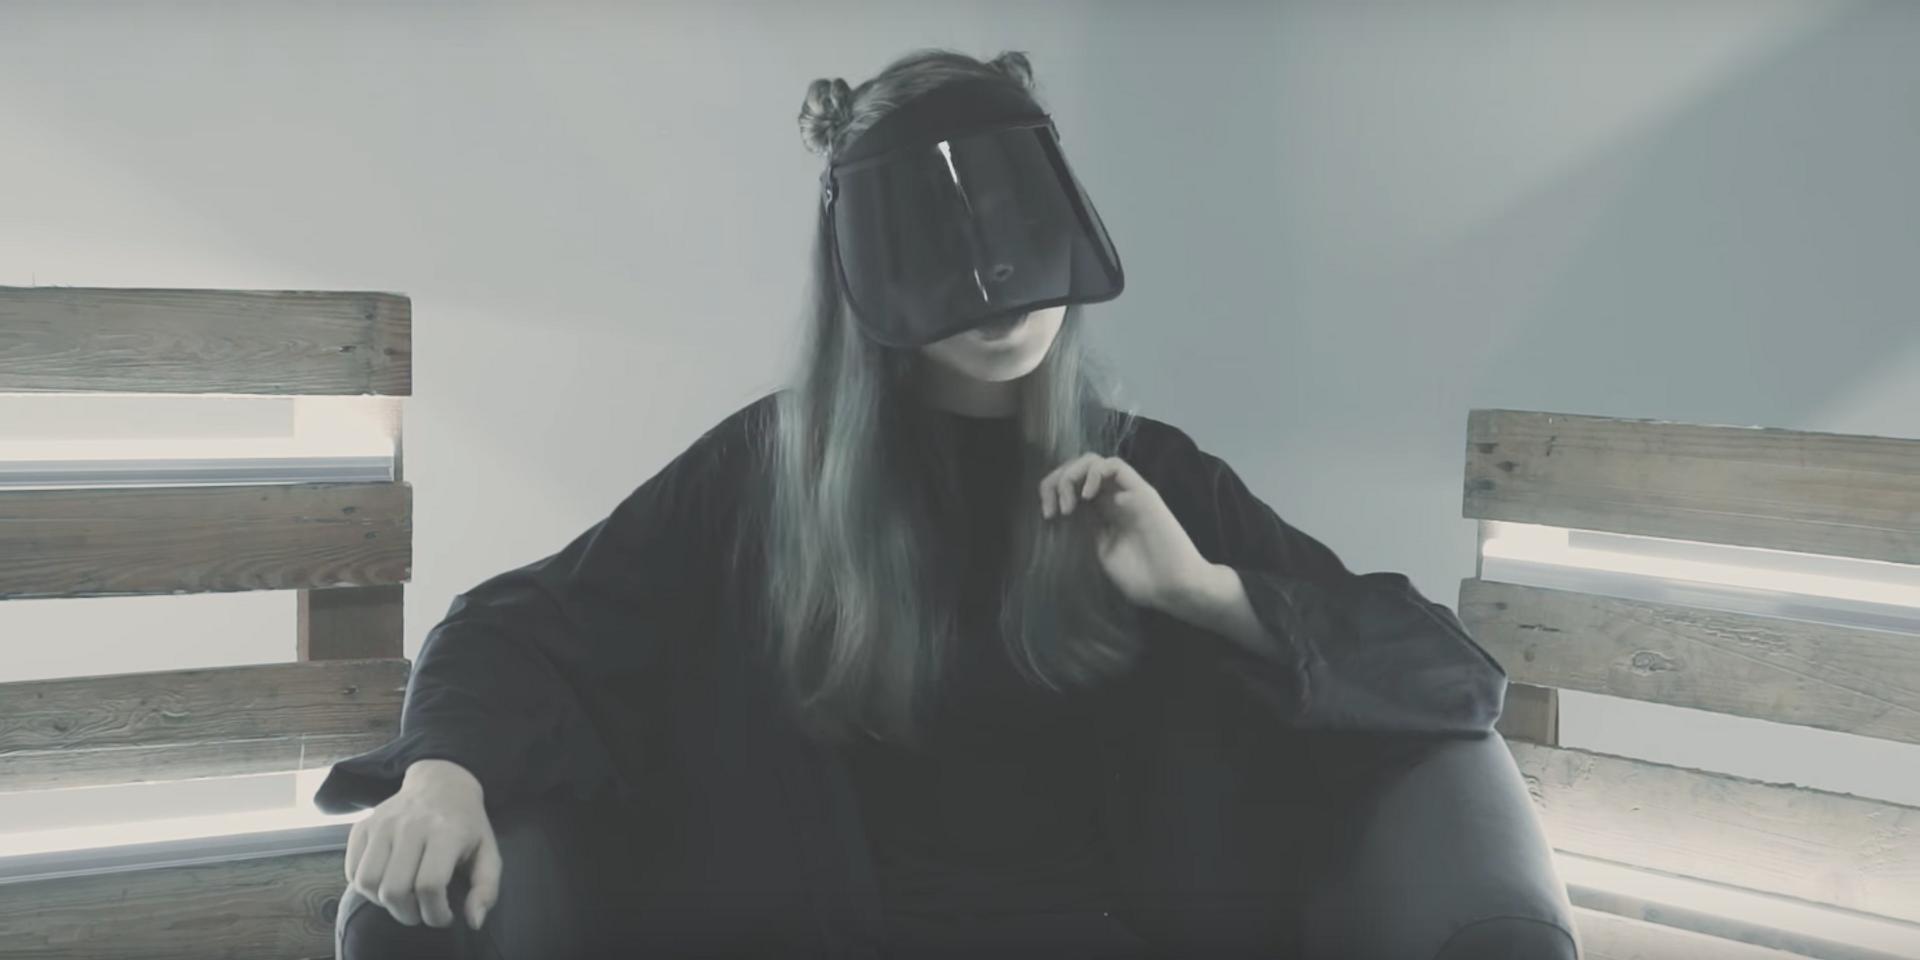 Jasmine Sokko breaks free in the music video for 'Porcupine' — watch